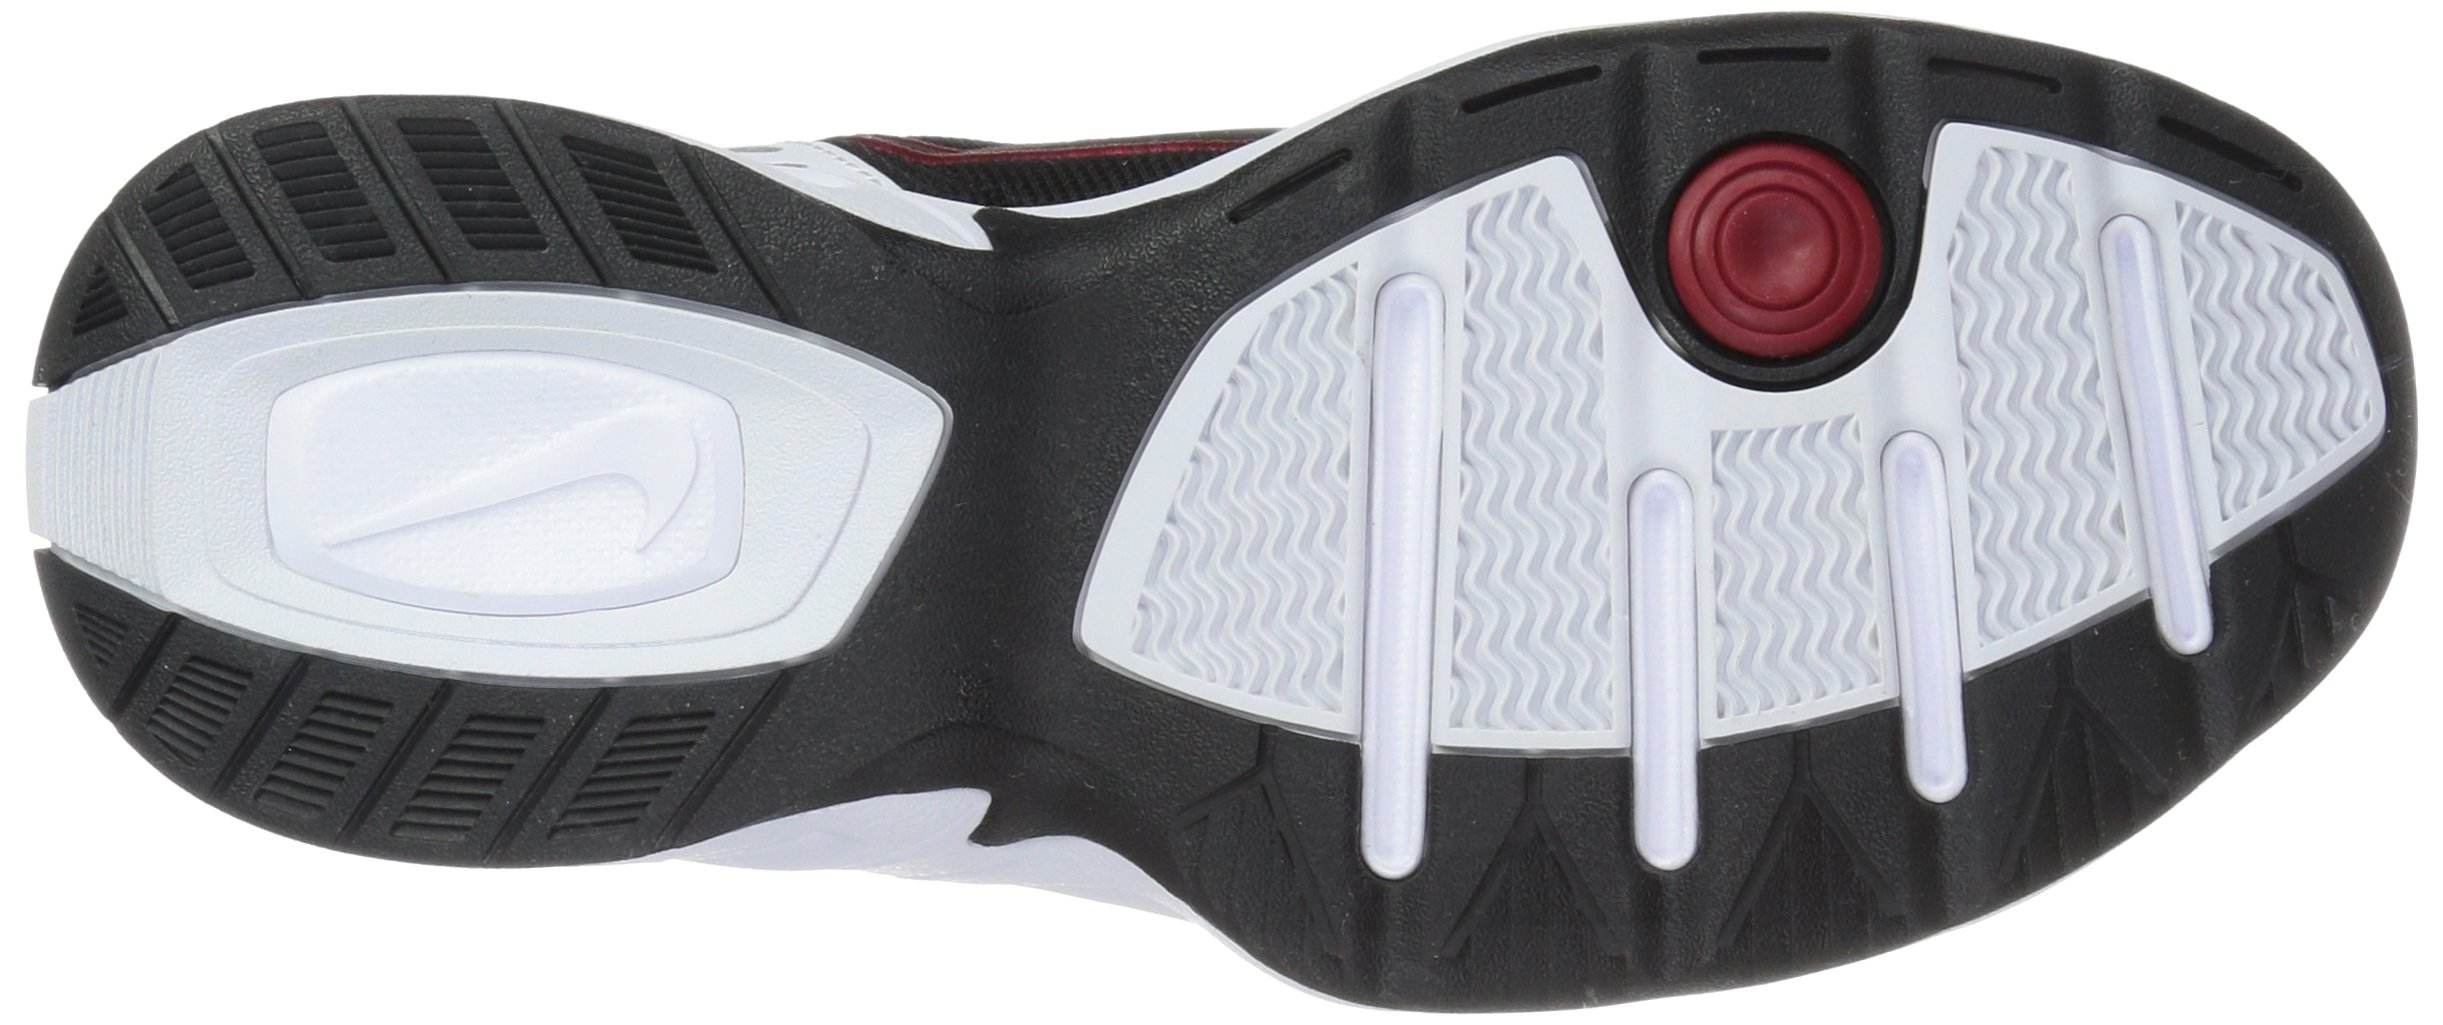 Nike Men's Air Monarch IV Cross Trainer, White/Black, 6.0 Regular US by Nike (Image #3)